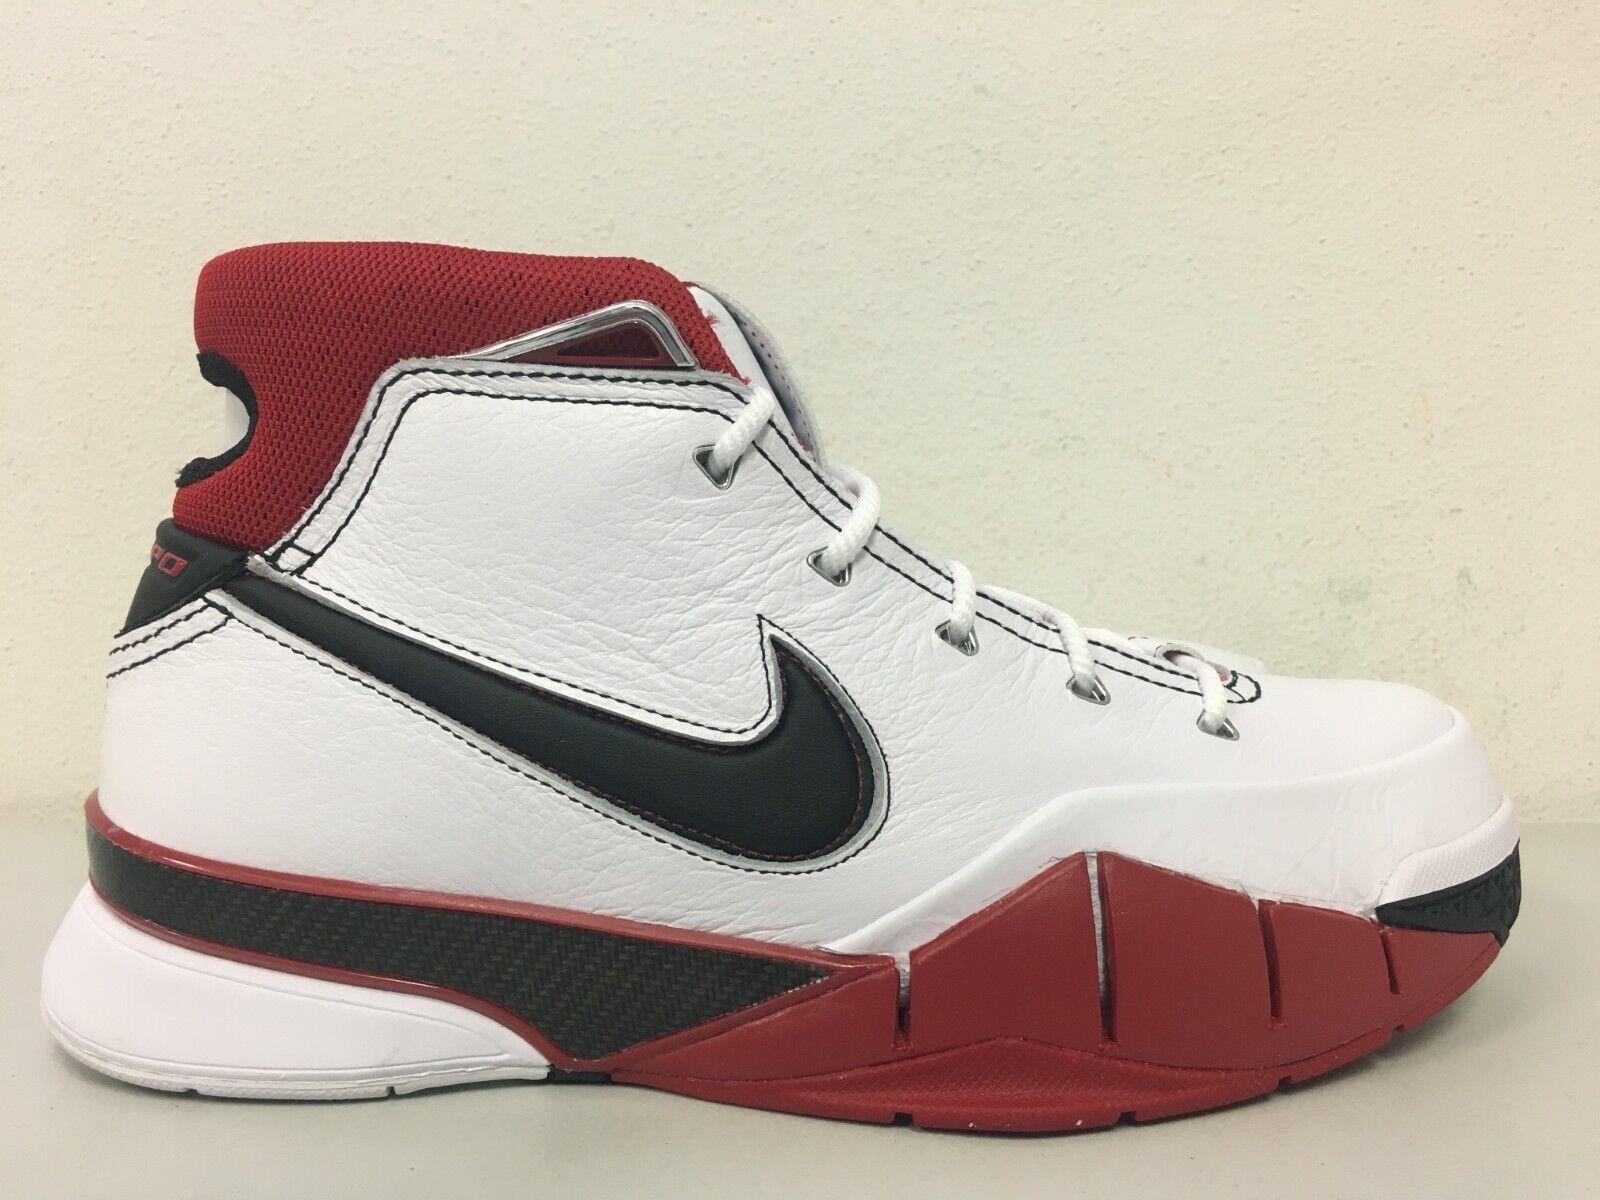 Nike Nike Nike Kobe 1 Predro Retro All-Star White Black Varsity Red AQ2728-102 Size 9.5 e95d08